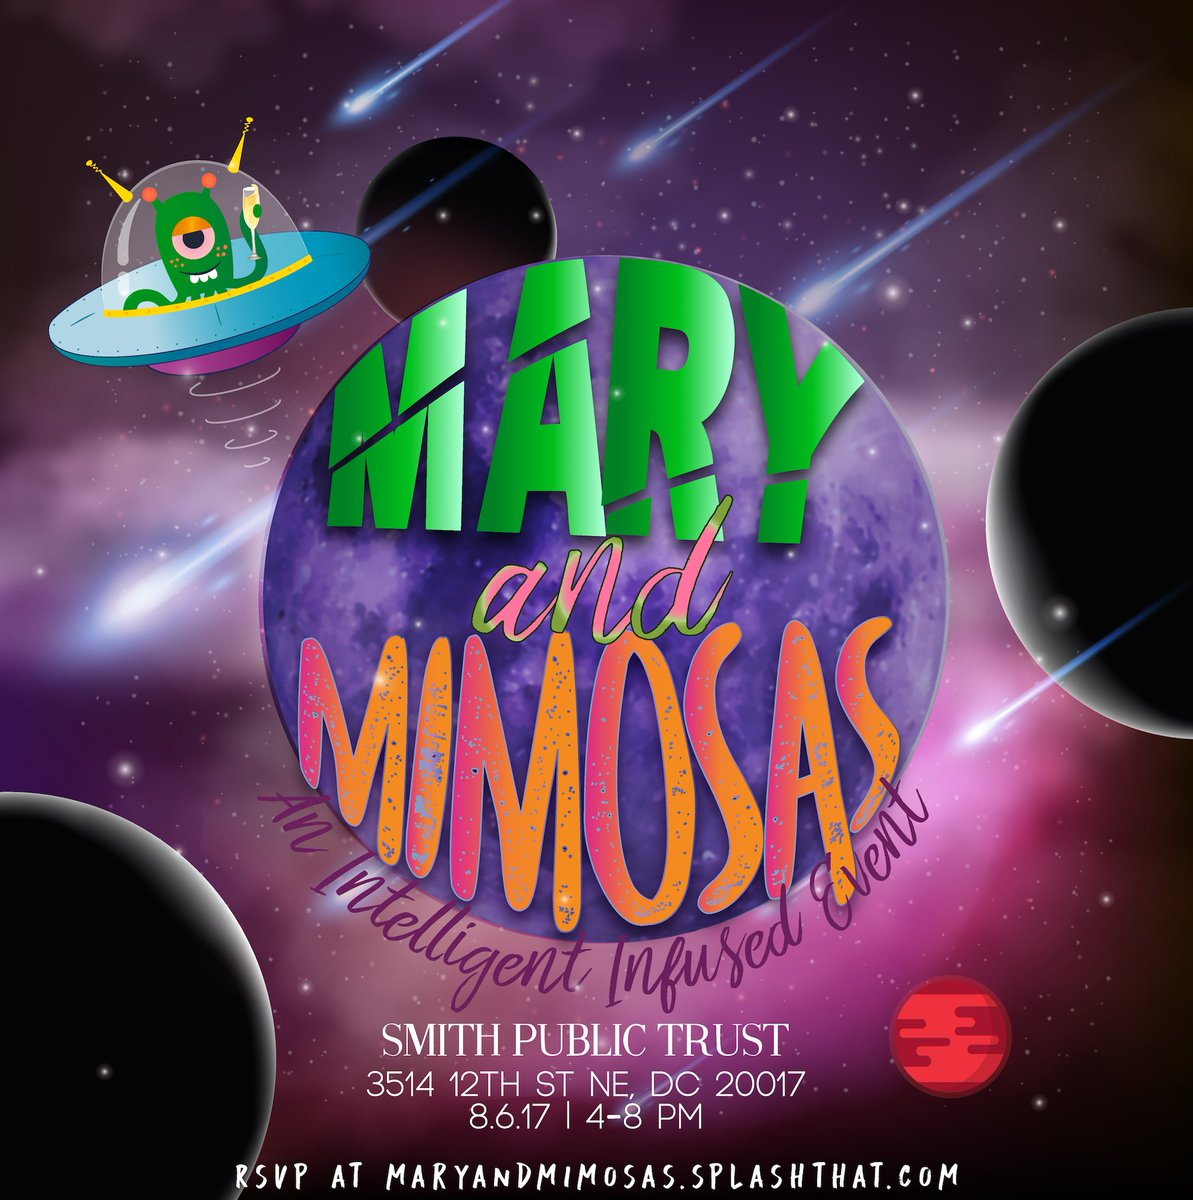 Next Event: infused mimosas, live music and artwork #MaryAndMimosas RSVP at  http:// maryandmimosas.splashthat.com  &nbsp;   #dcevent #dc #dmv #cannabis<br>http://pic.twitter.com/rA6m1zzsgz